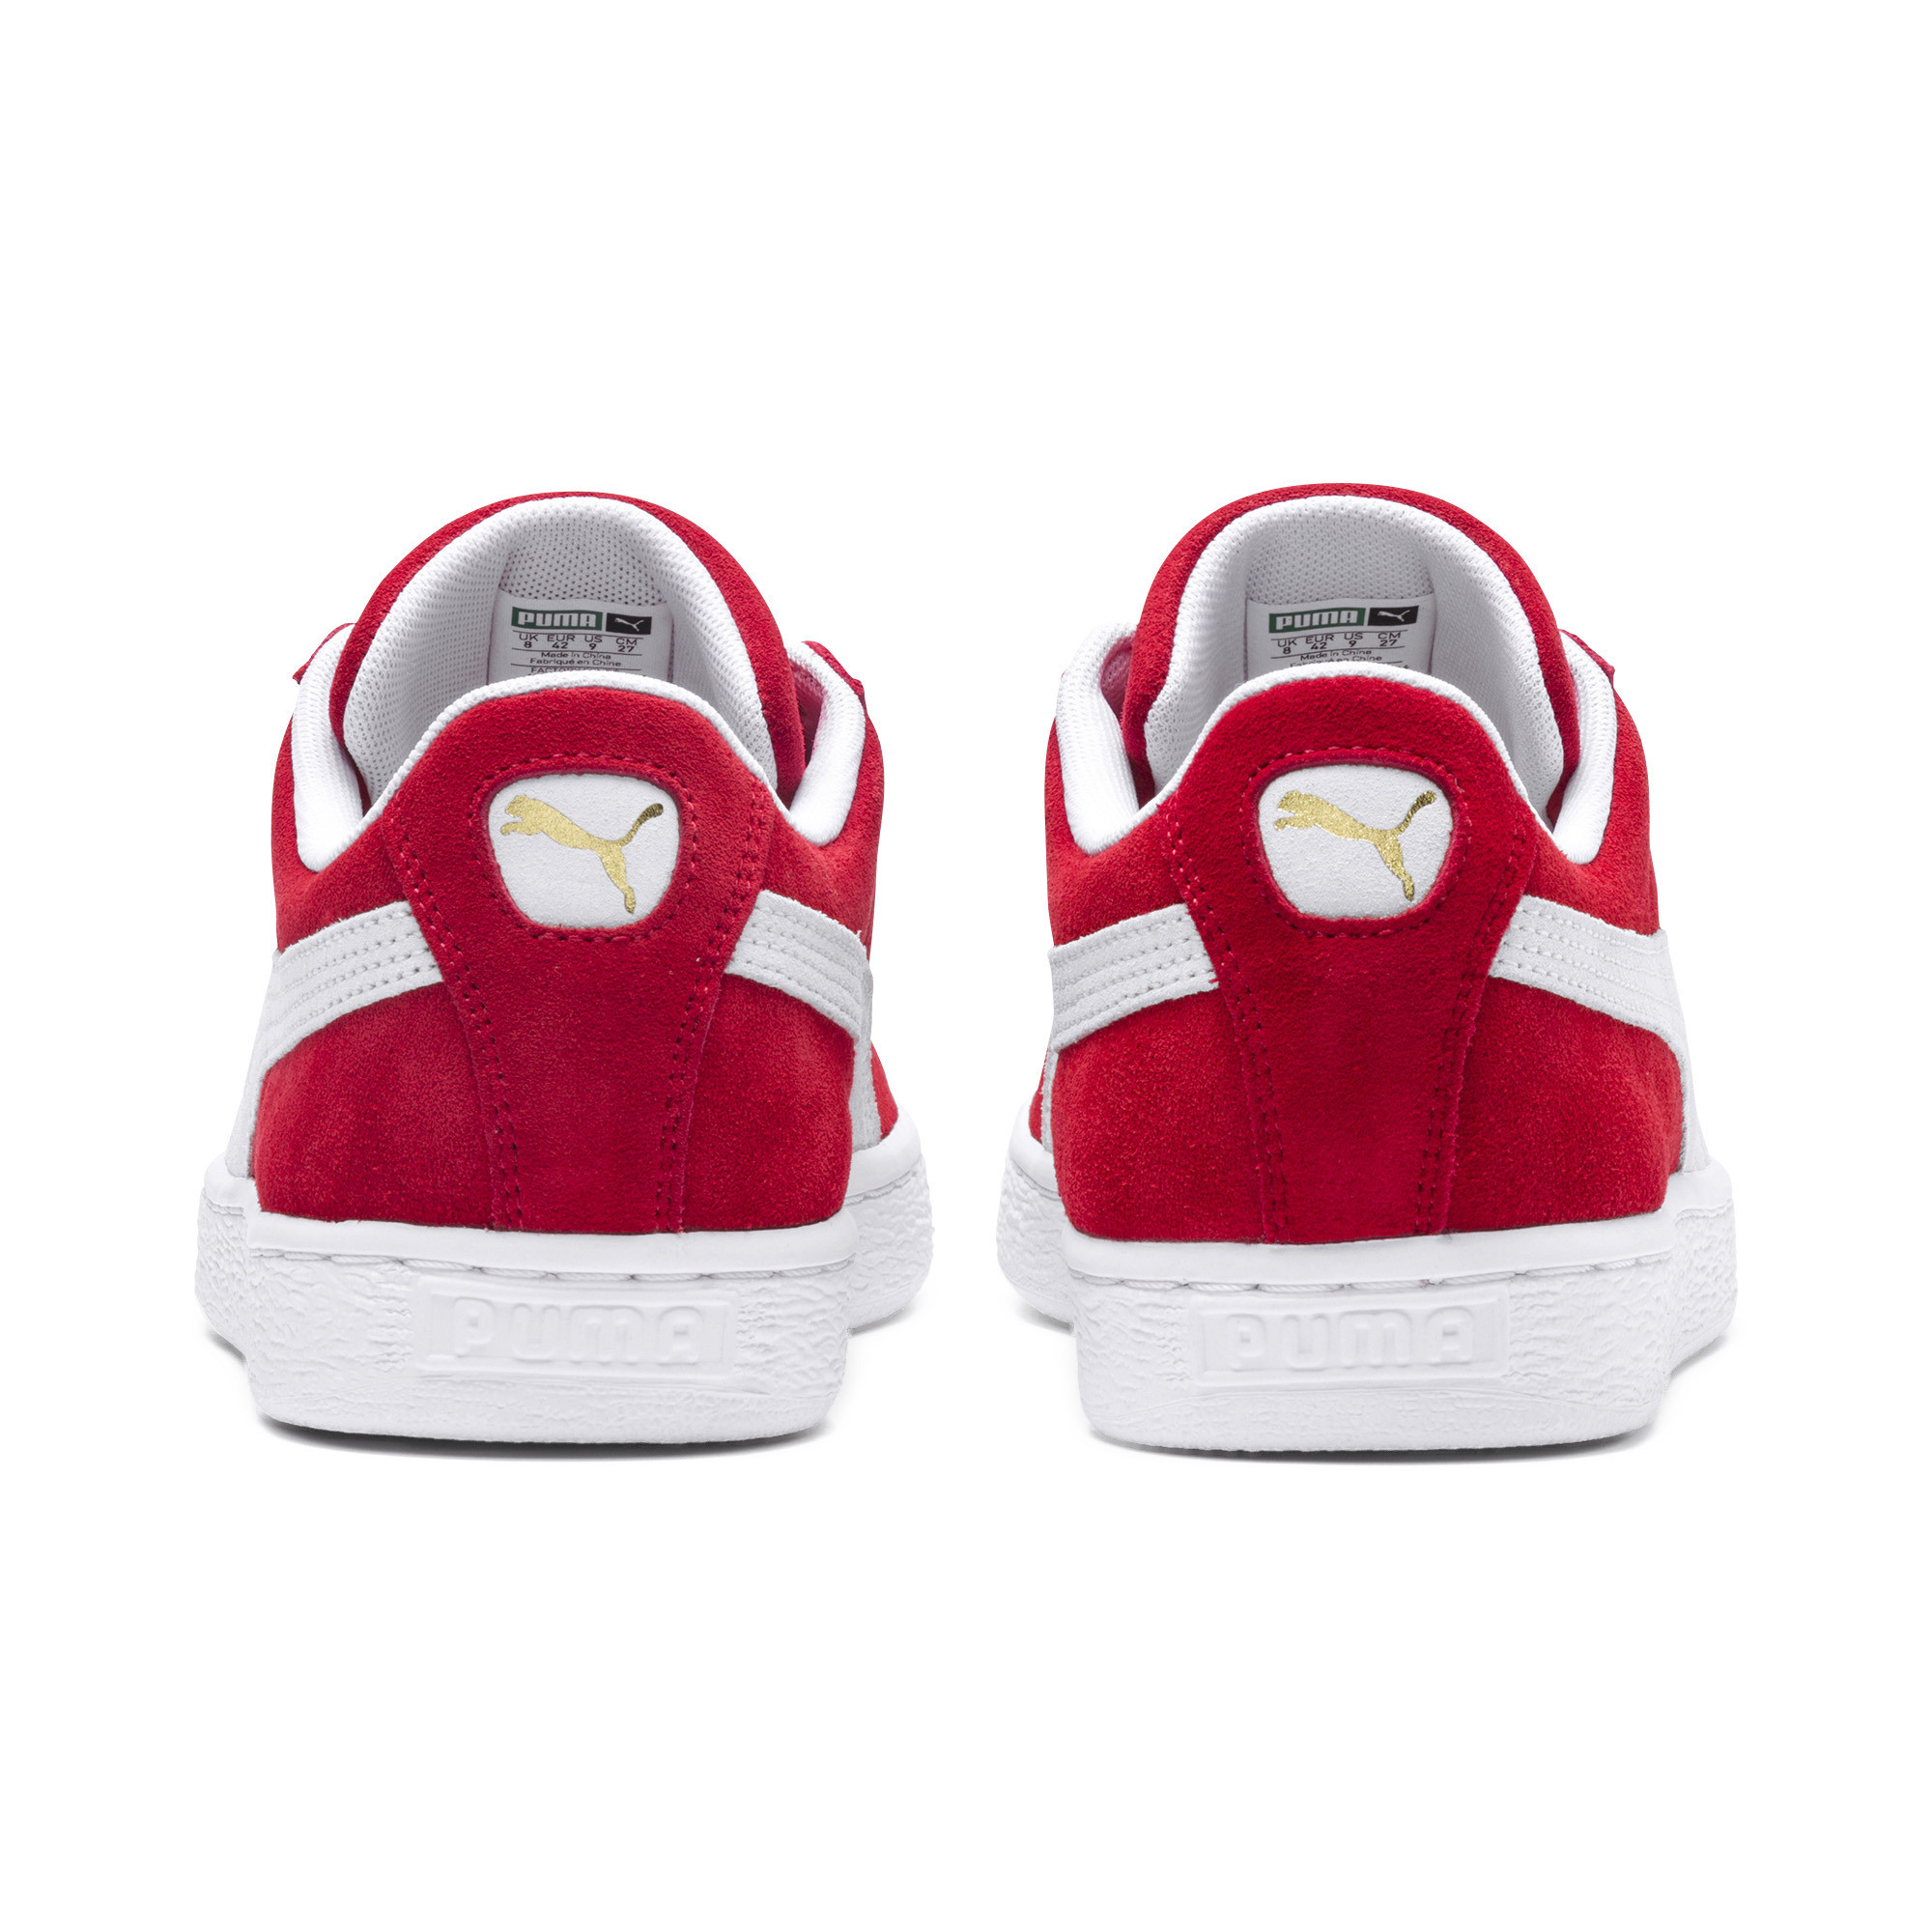 PUMA-Suede-Classic-Sneakers-Men-Shoe-Sport-Shoe thumbnail 15